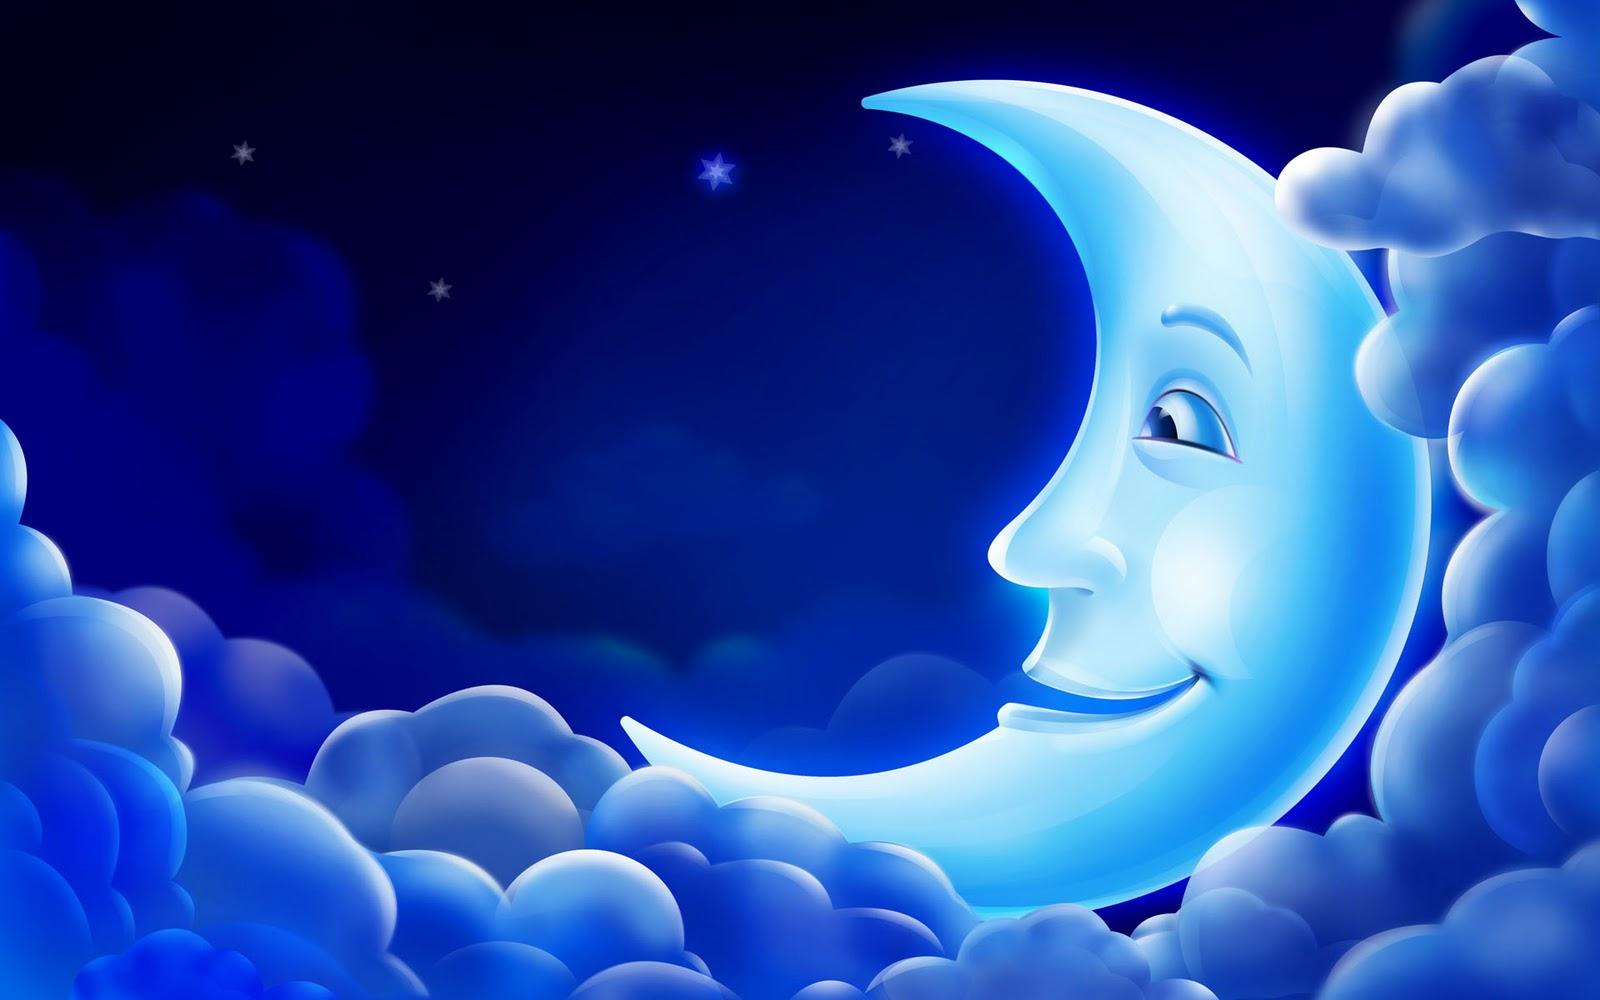 http://3.bp.blogspot.com/-gpbVe29vSGI/UBg6TJi6SdI/AAAAAAAADx4/uiHvqdTkfu0/s1600/CG+3D+Animation+PC+Background+blue+moon+smile+sky++star+wallpapers.jpg